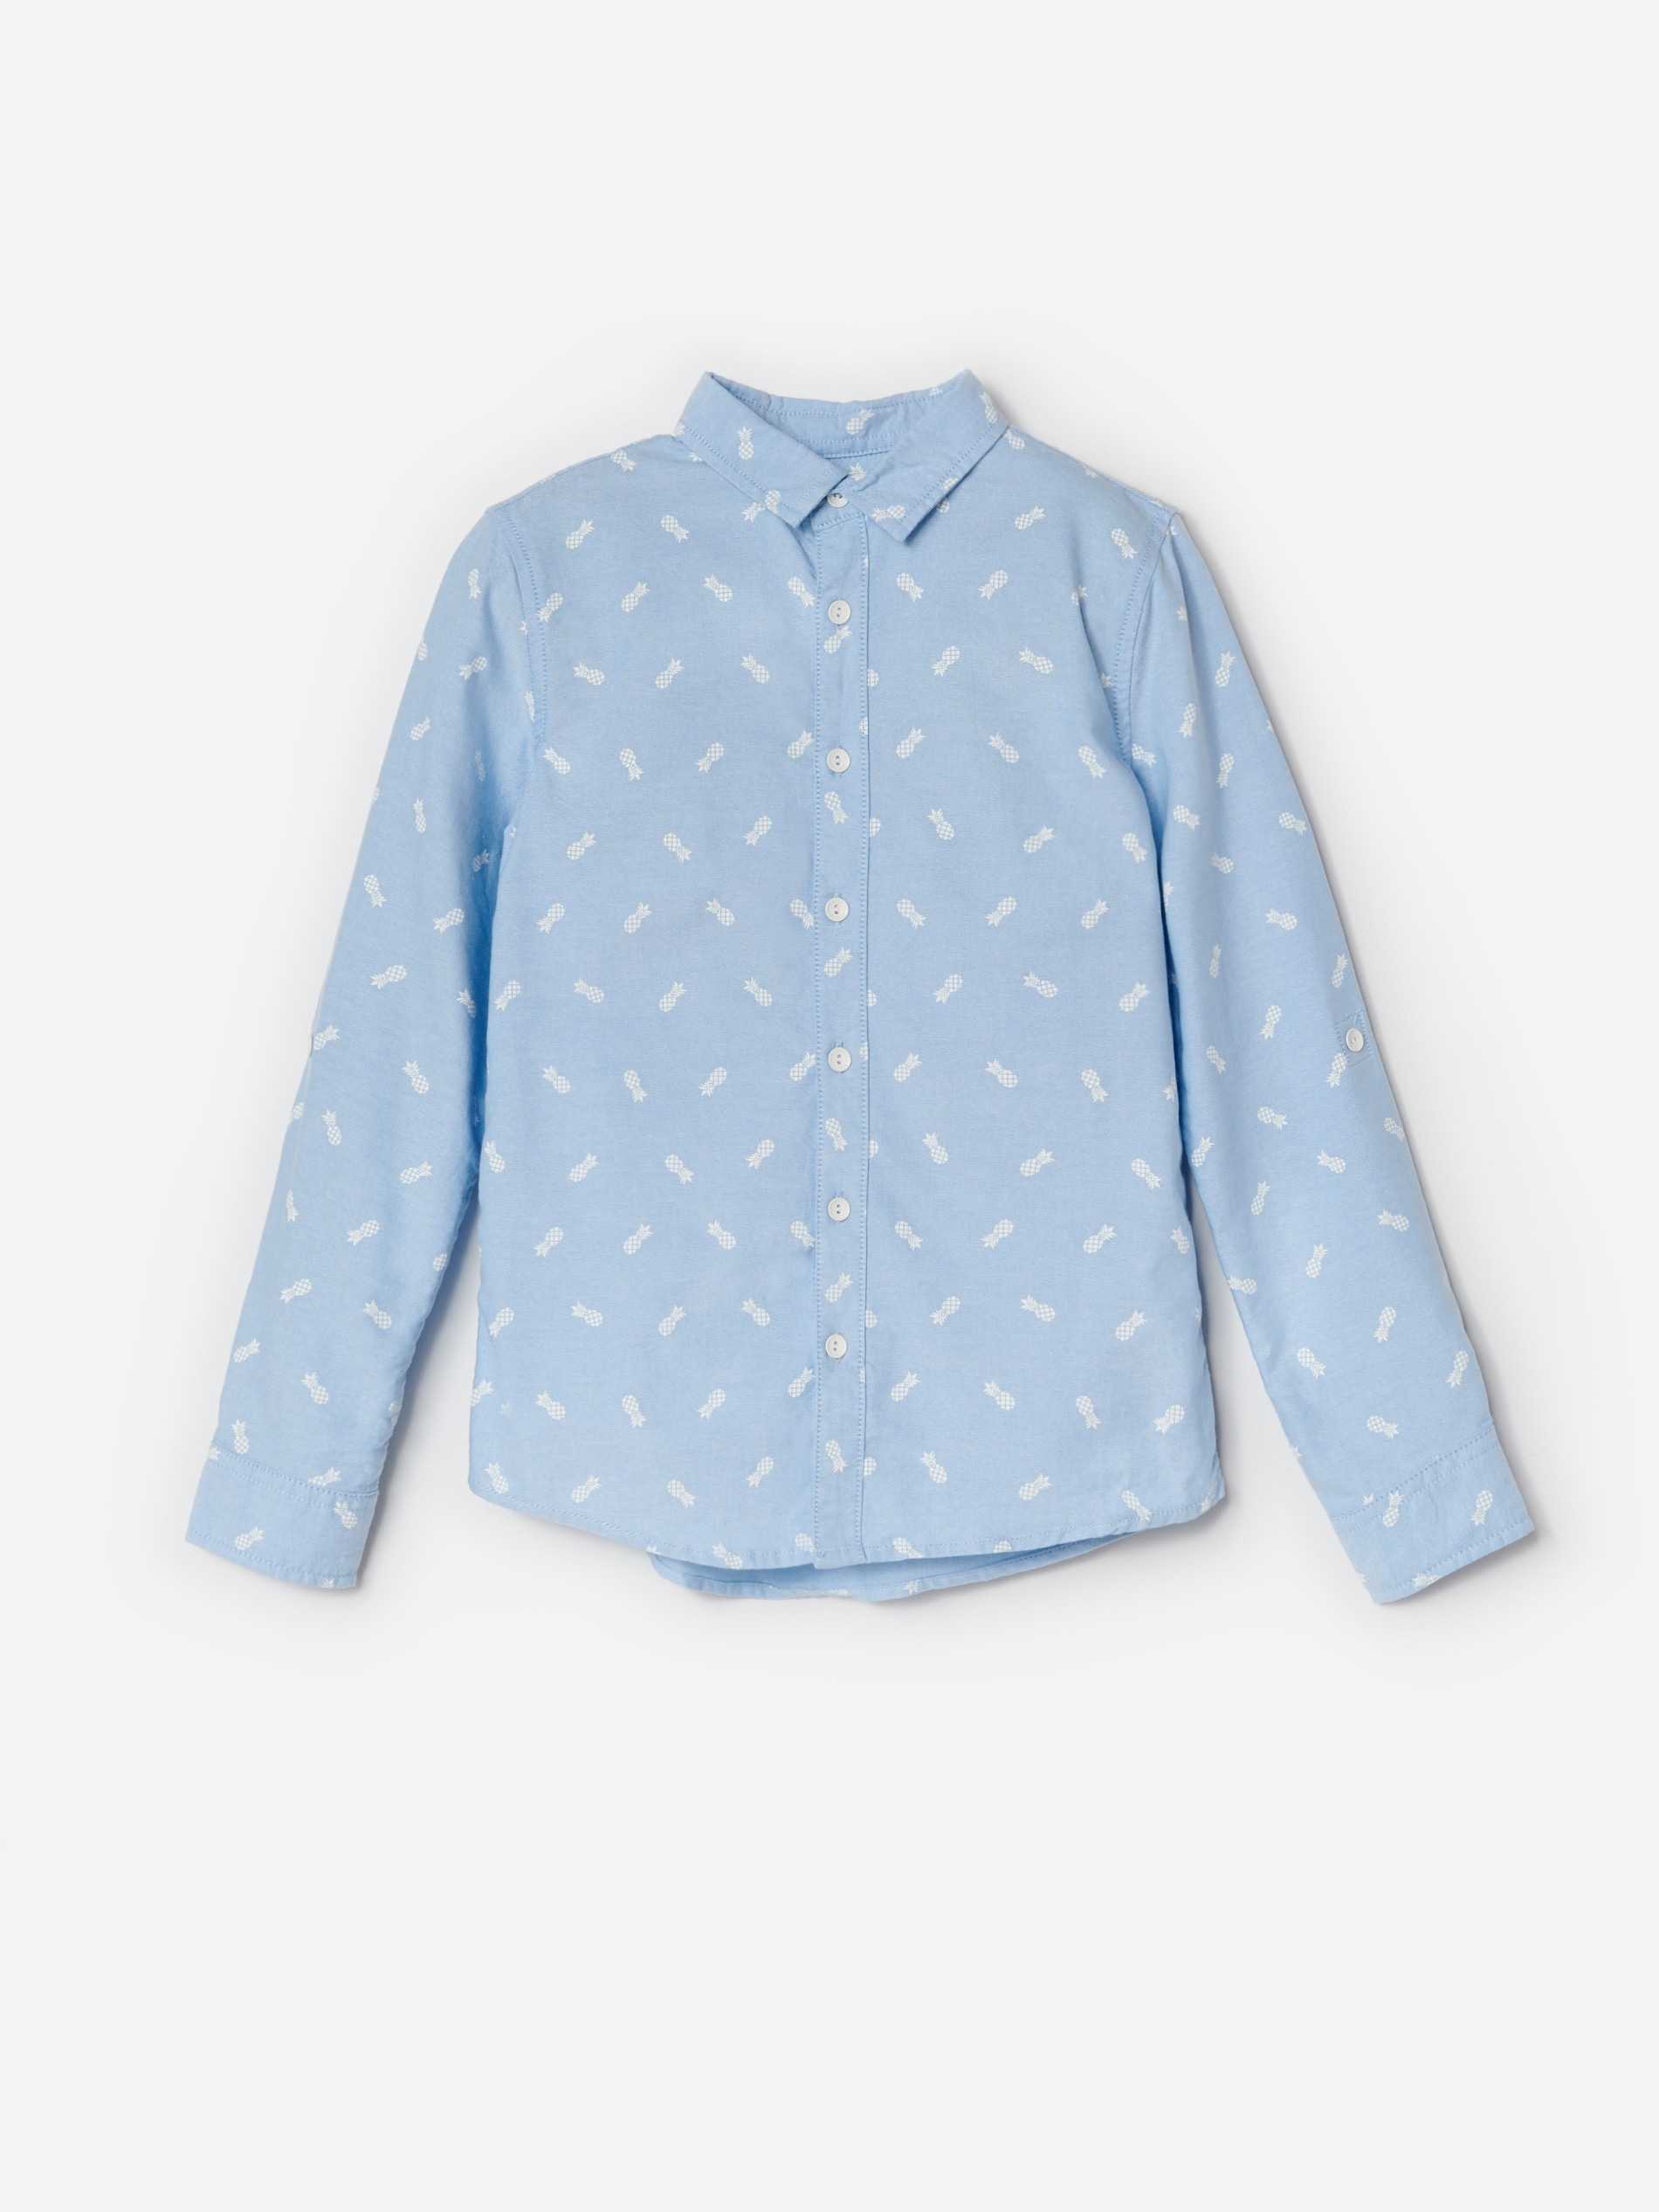 Bawełniana koszula ze wzorem